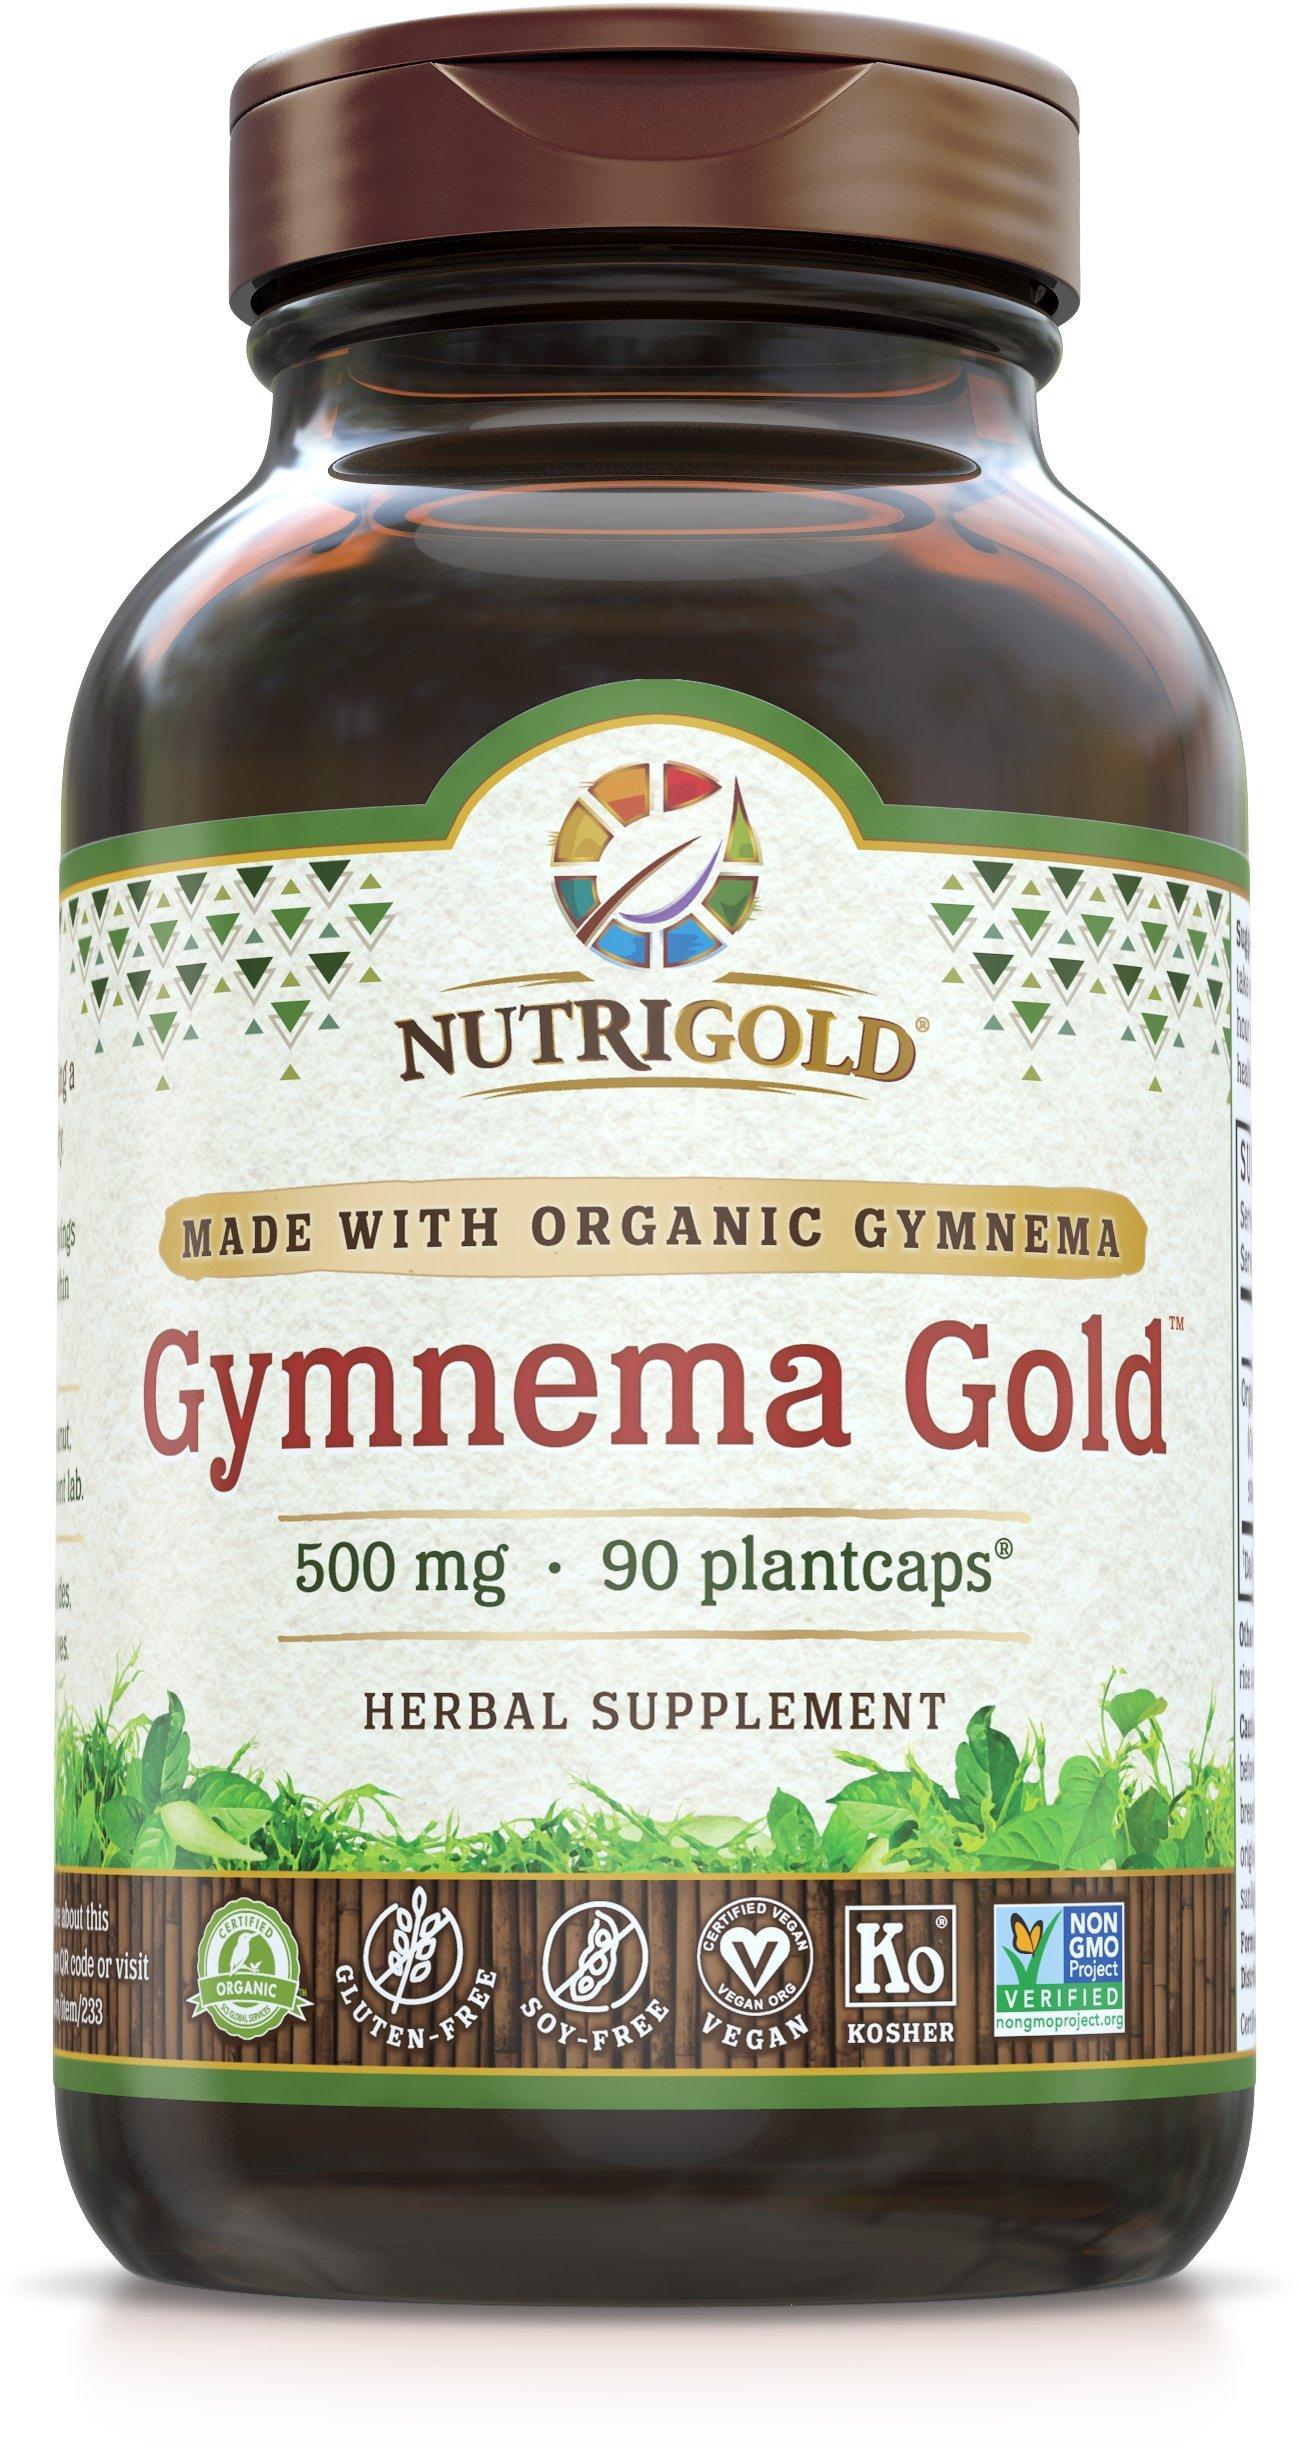 Gymnema Gold (Made with Organic Gymnema), 500 mg, 90 plantcaps